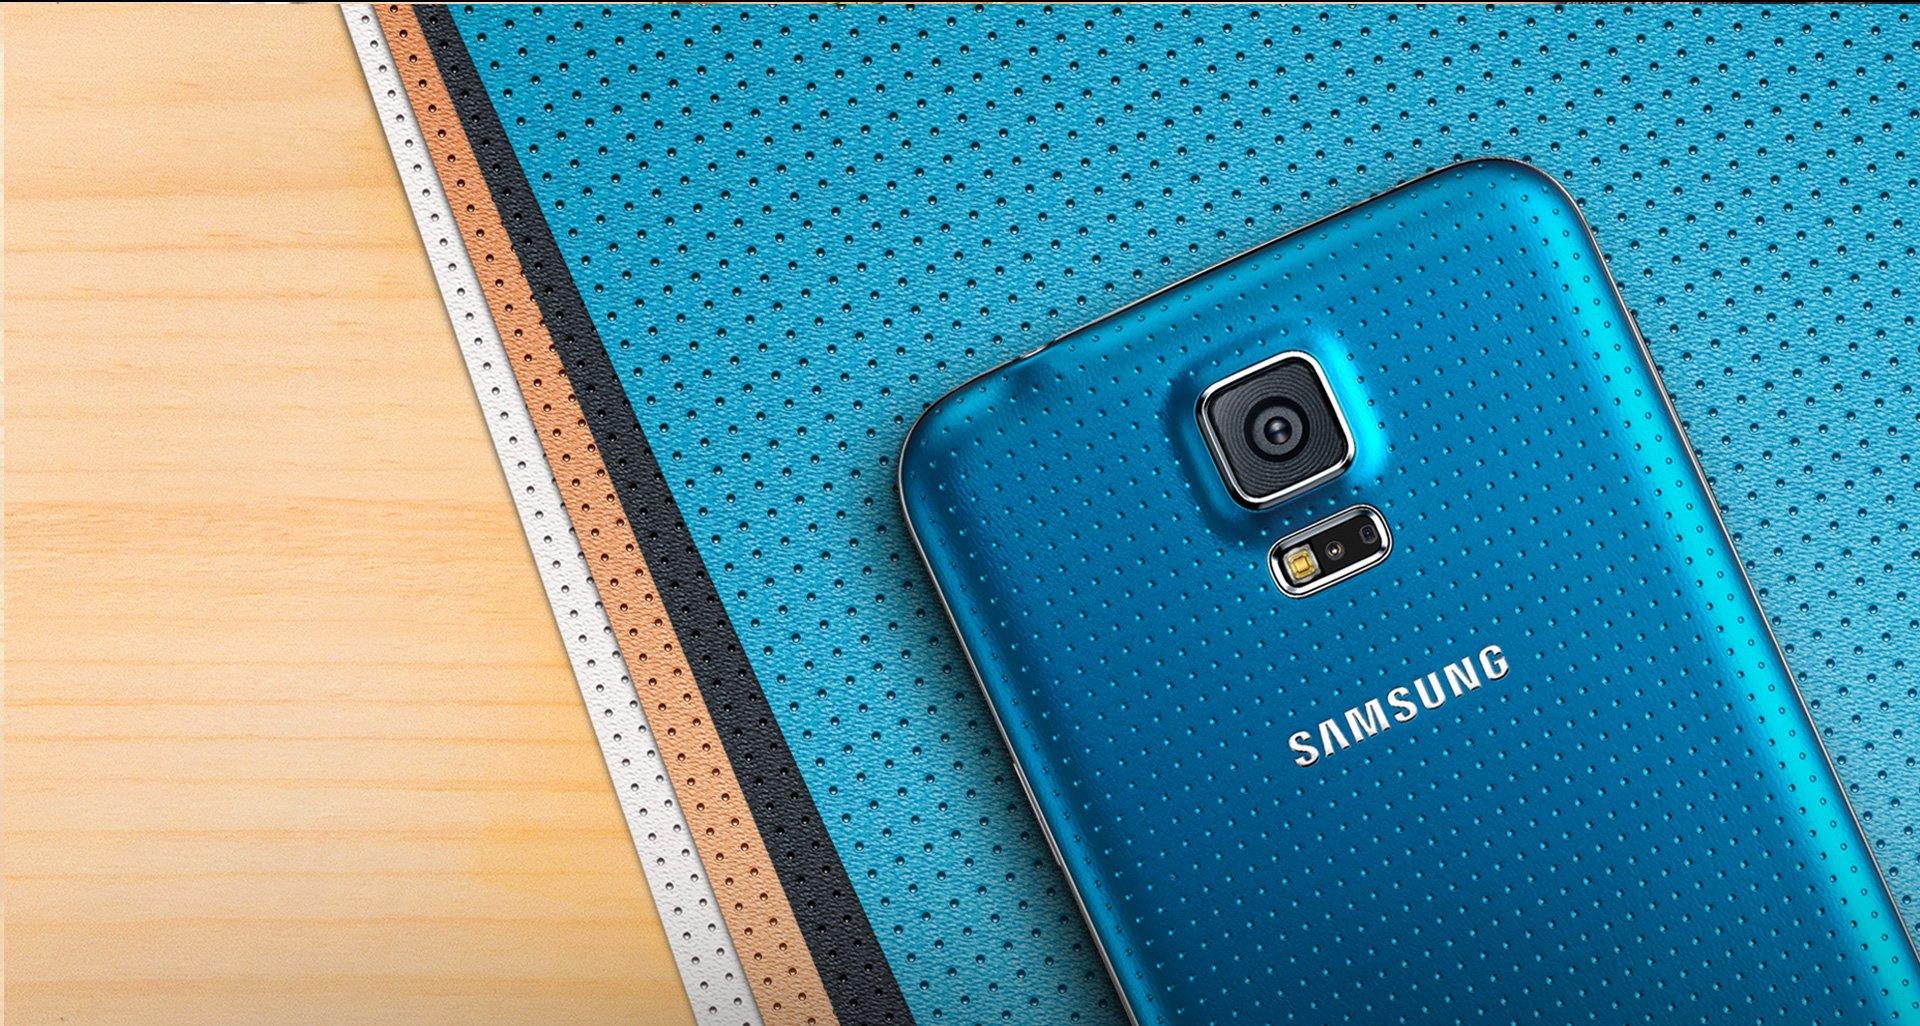 Баннер смартфона Samsung Galaxy S5